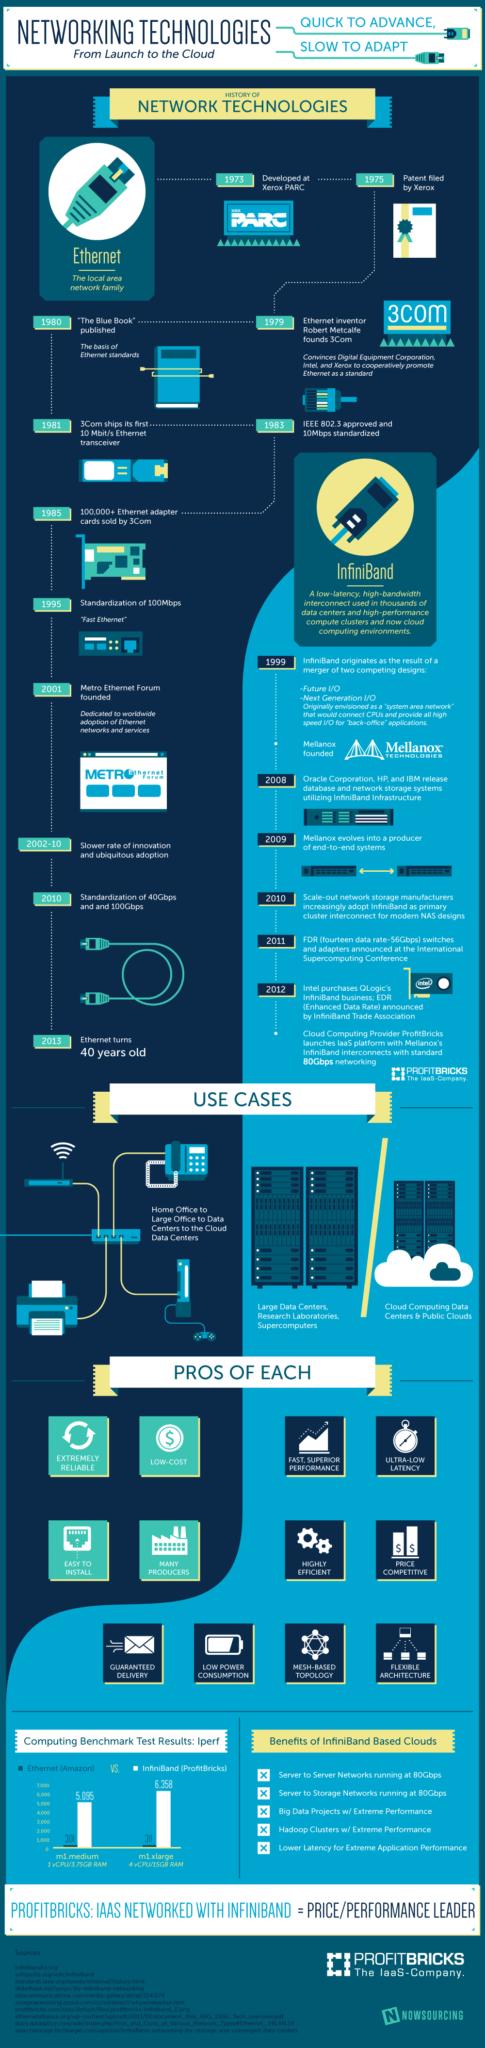 Cloud-Computing-Networks-InfiniBand-ProfitBricks